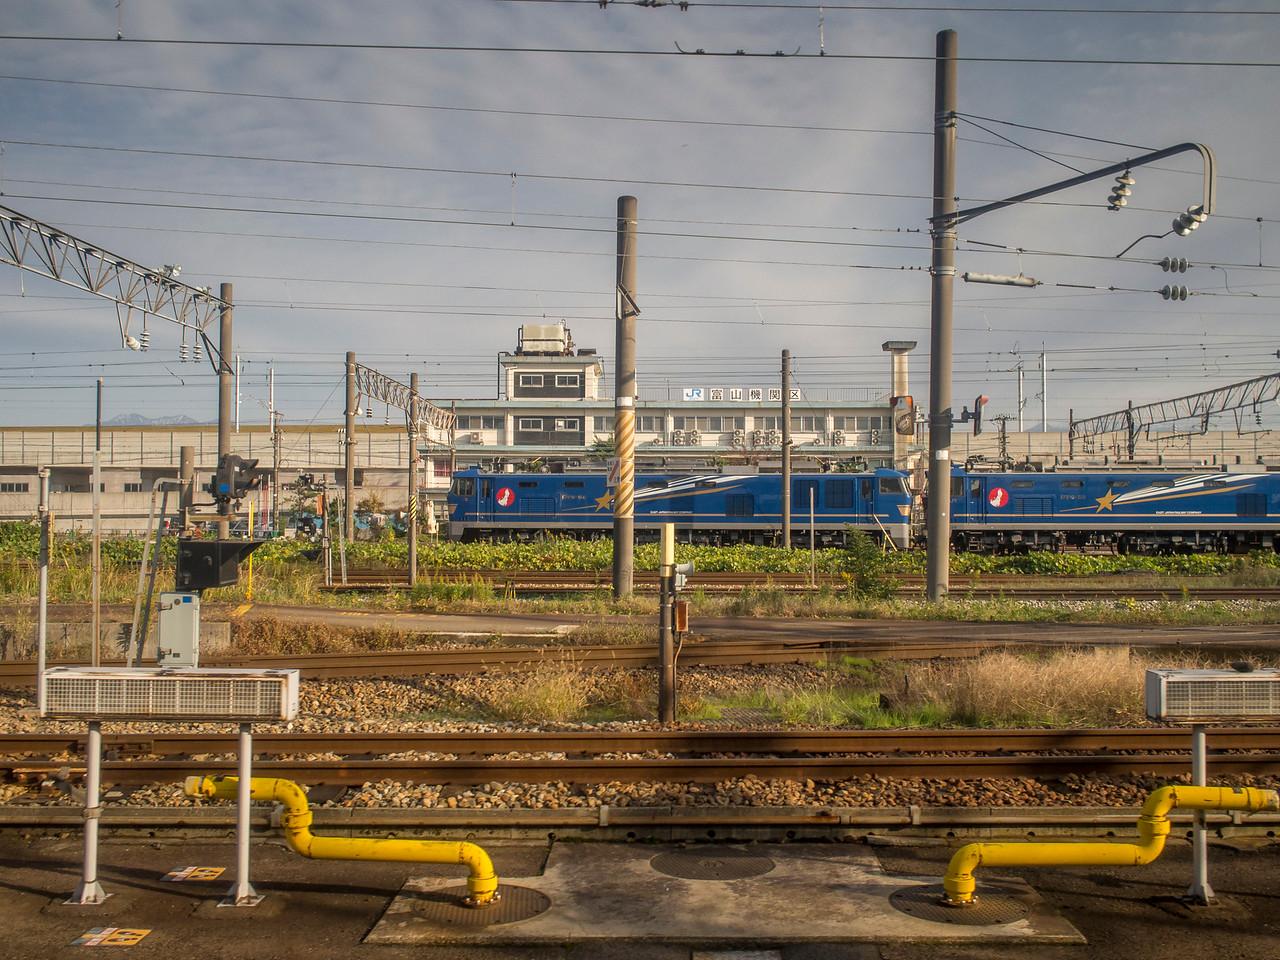 Train from Tokyo to Kanazawa